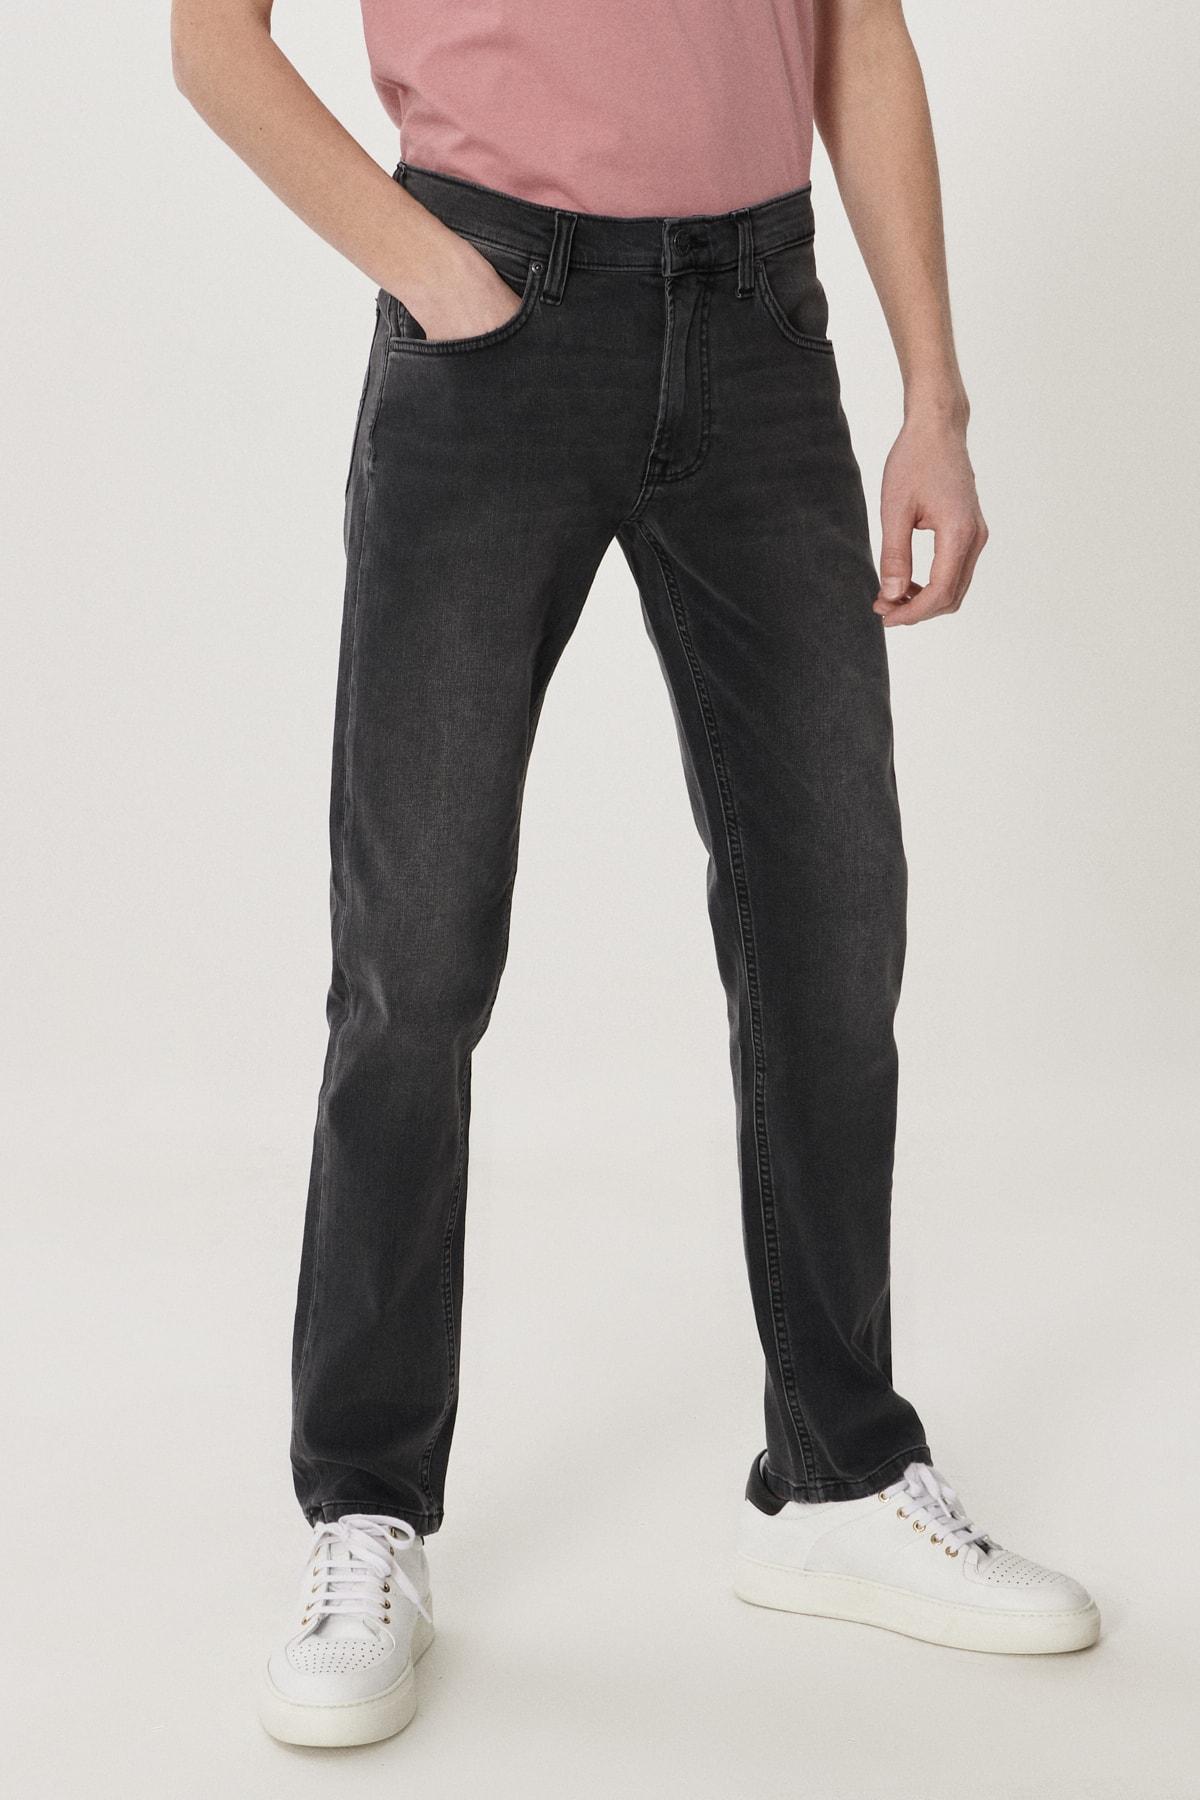 Daren Erkek Siyah Straight Fit Normal Bel Düz Paça Esnek Jean Pantolon